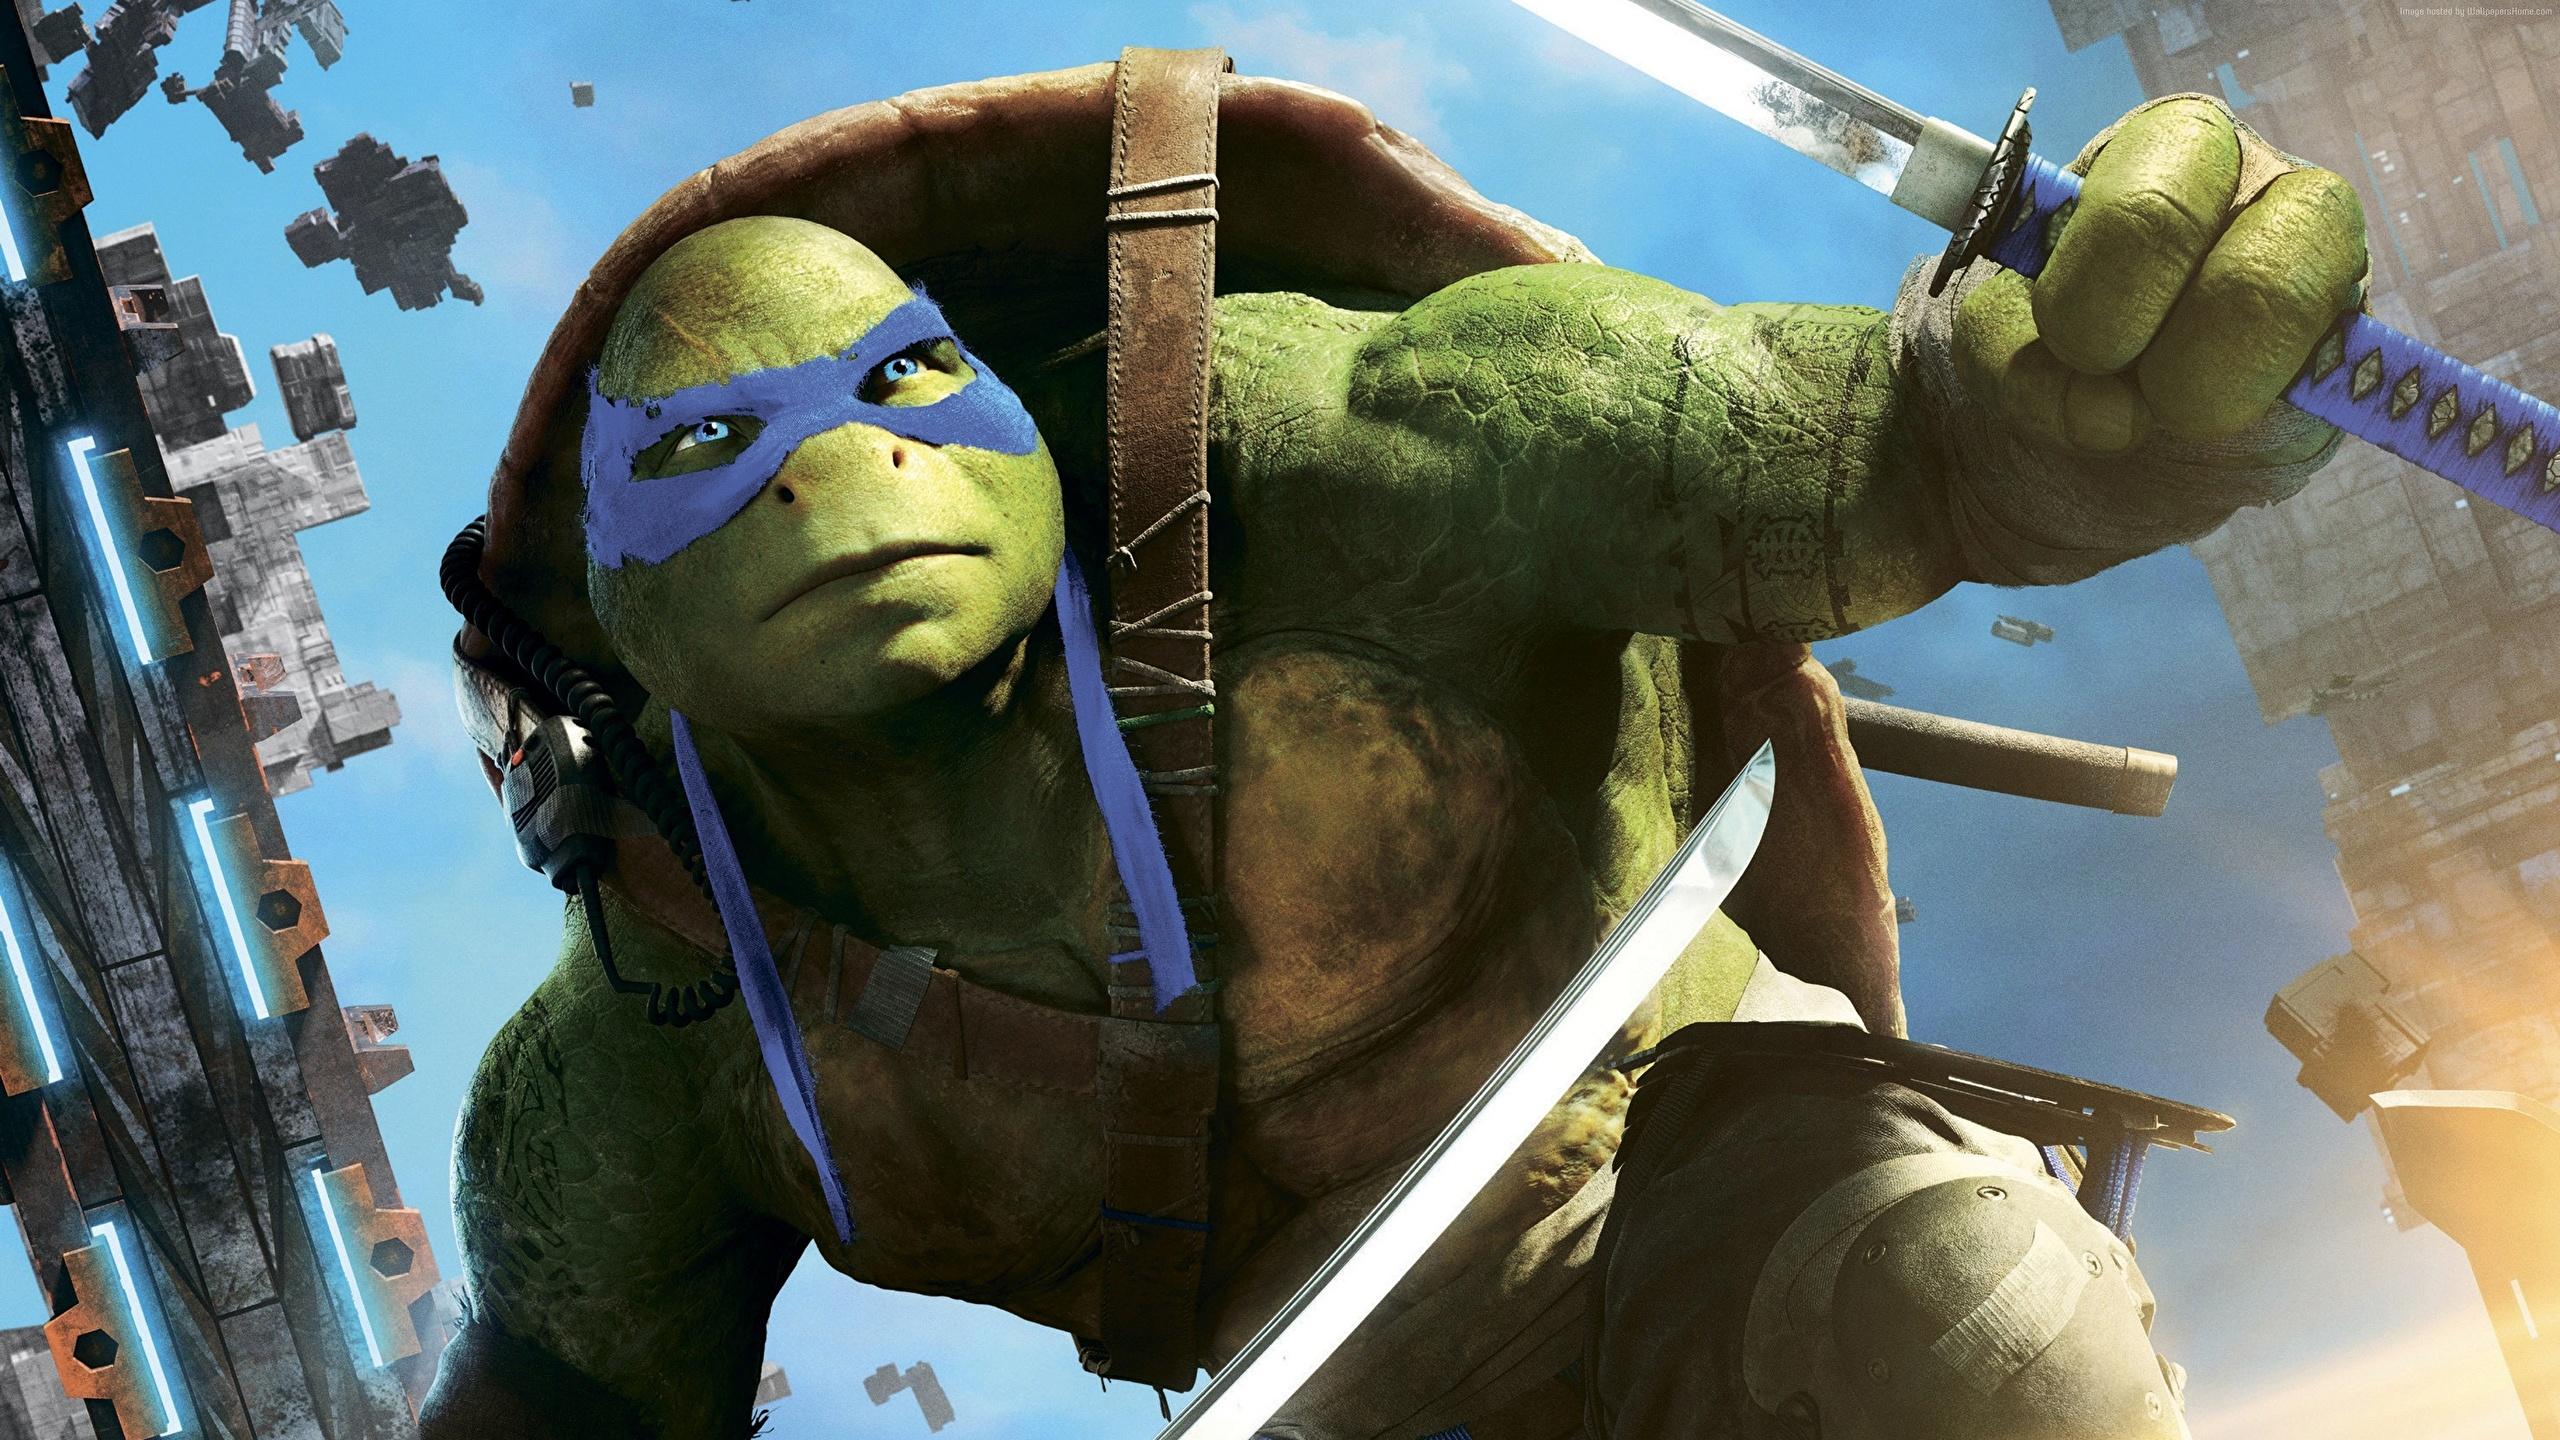 Wallpaper Teenage Mutant Ninja Turtles 2014 Warrior Movies 2560x1440